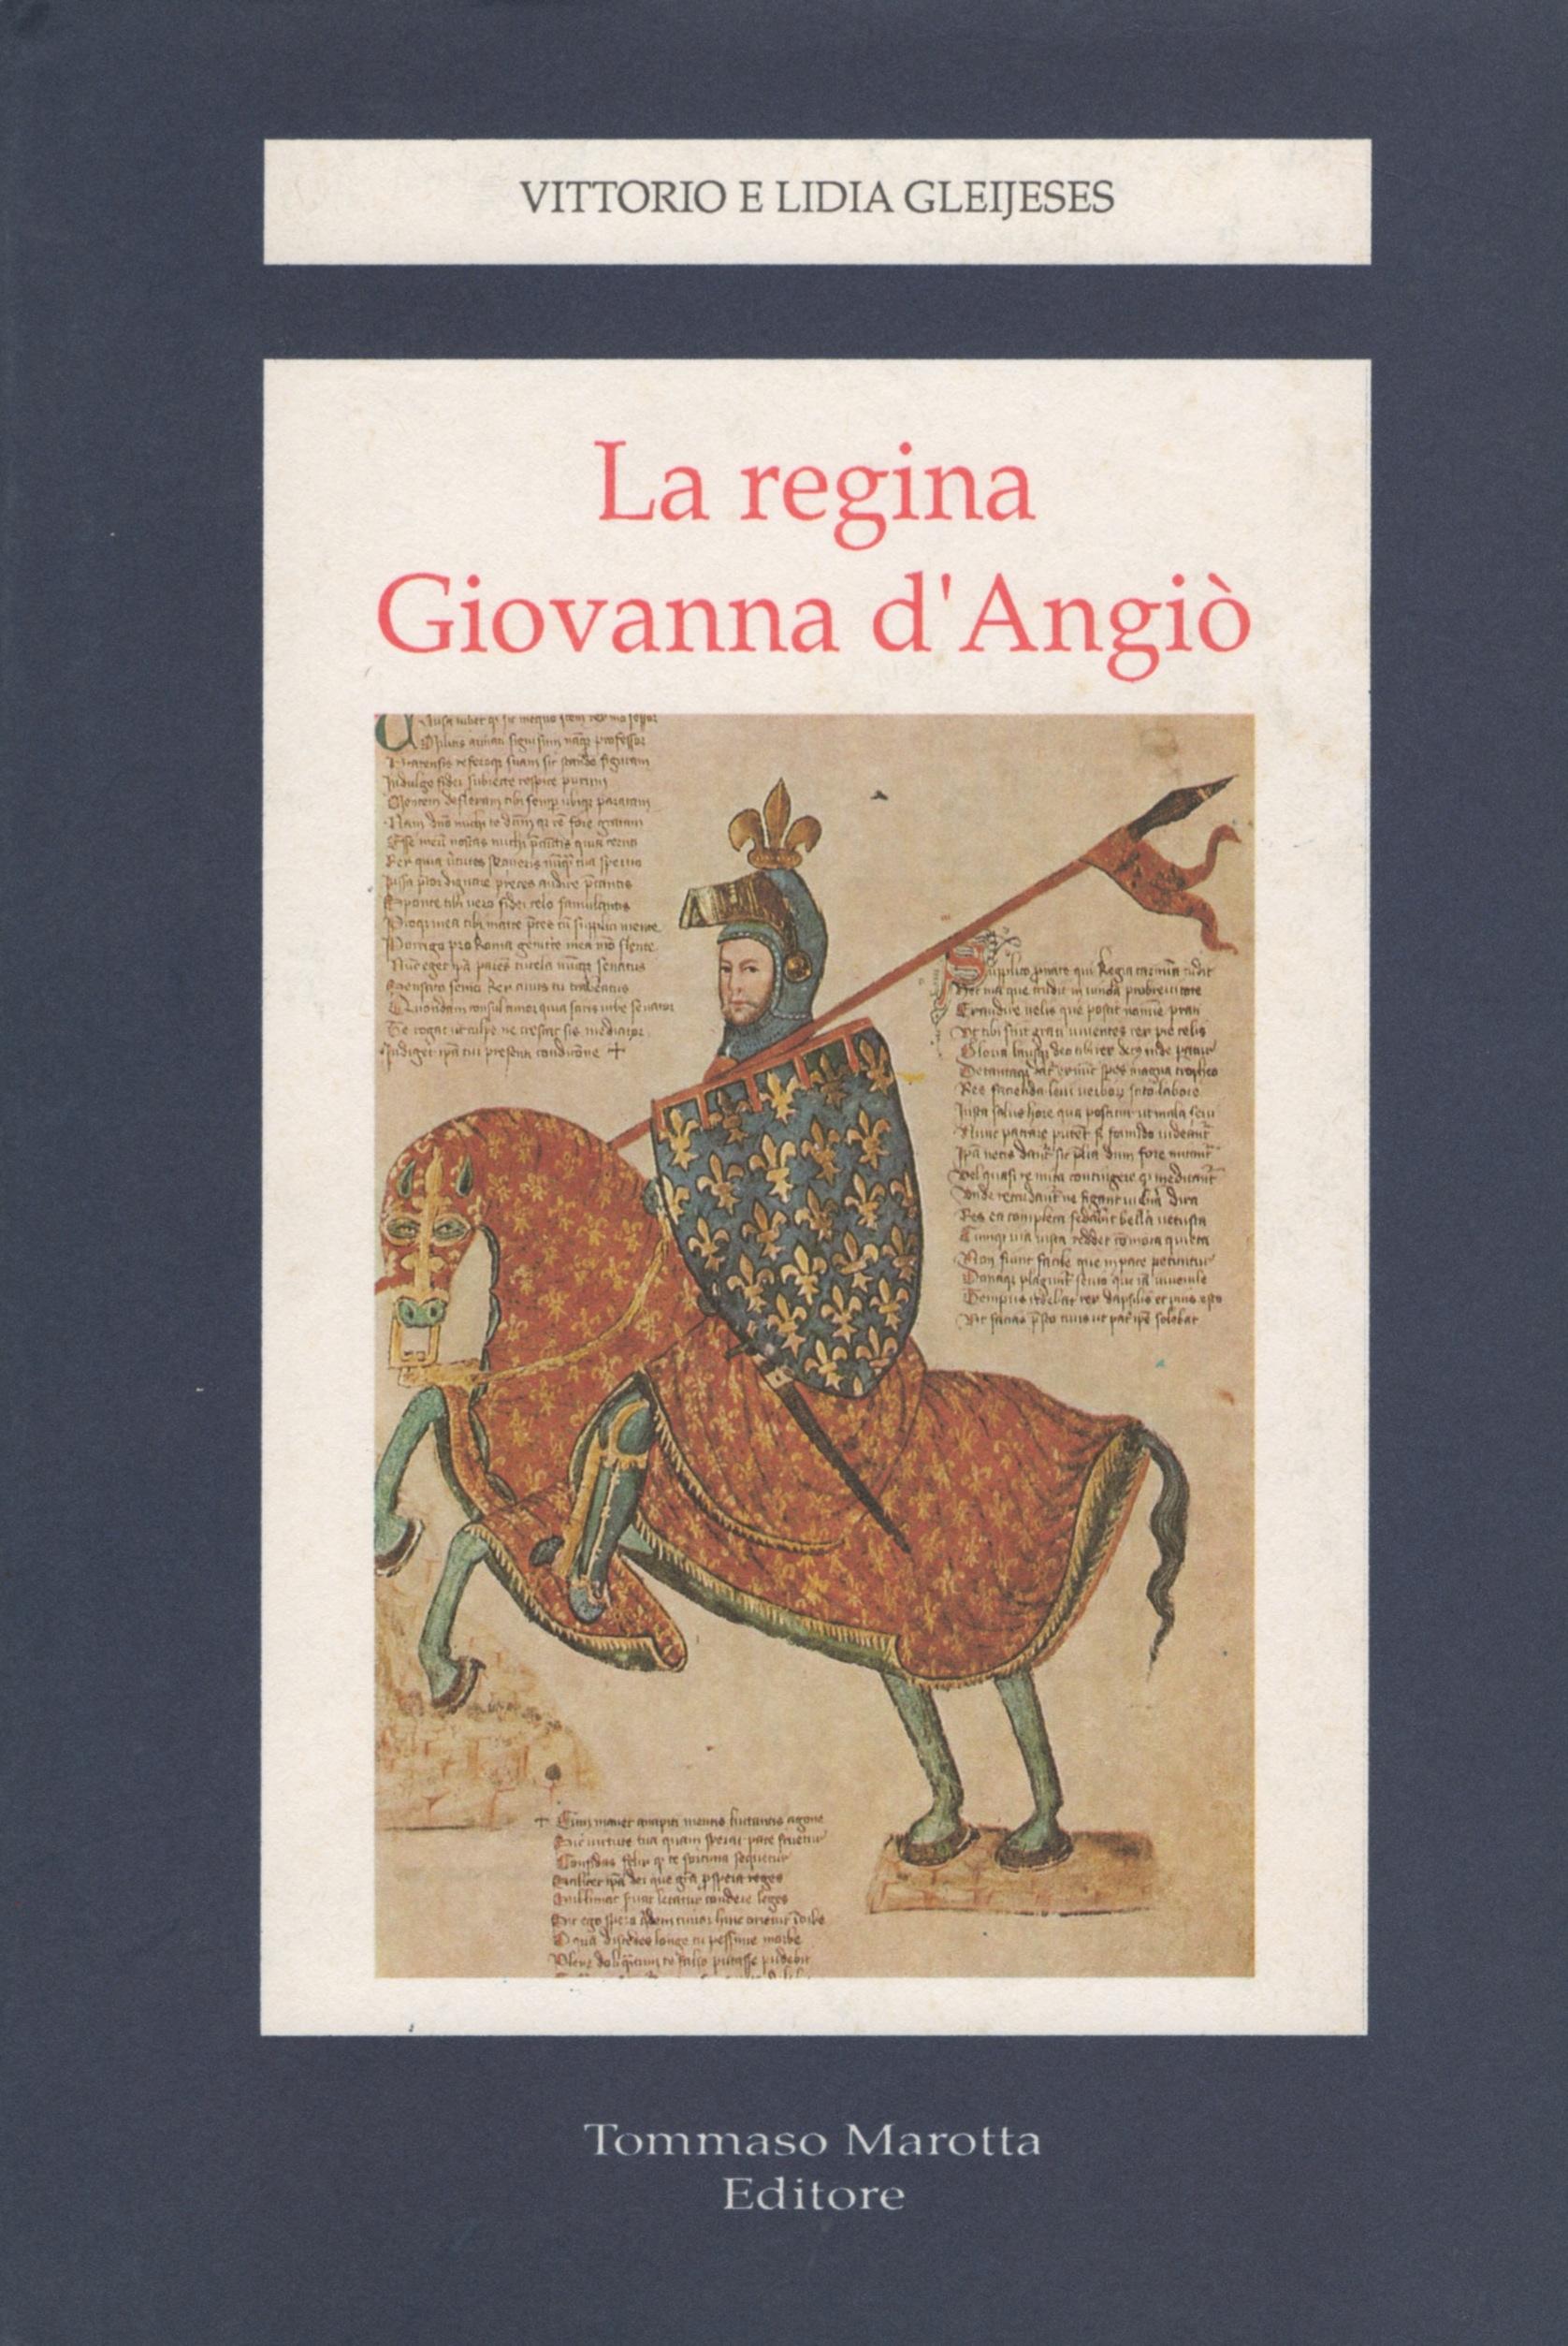 La regina Giovanna d'Angiò